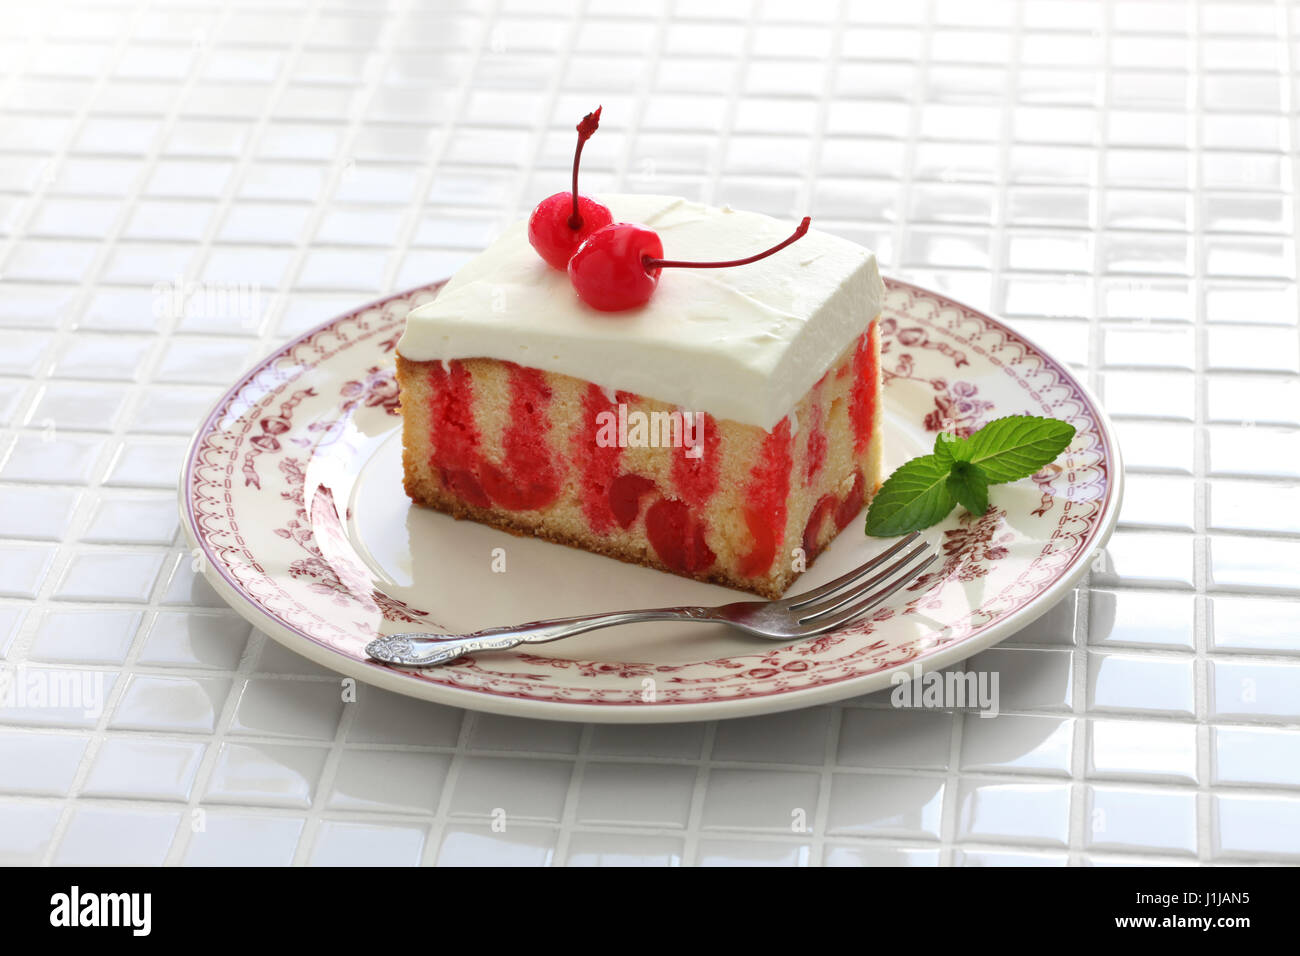 Chocolate Cherry Rolled Cake